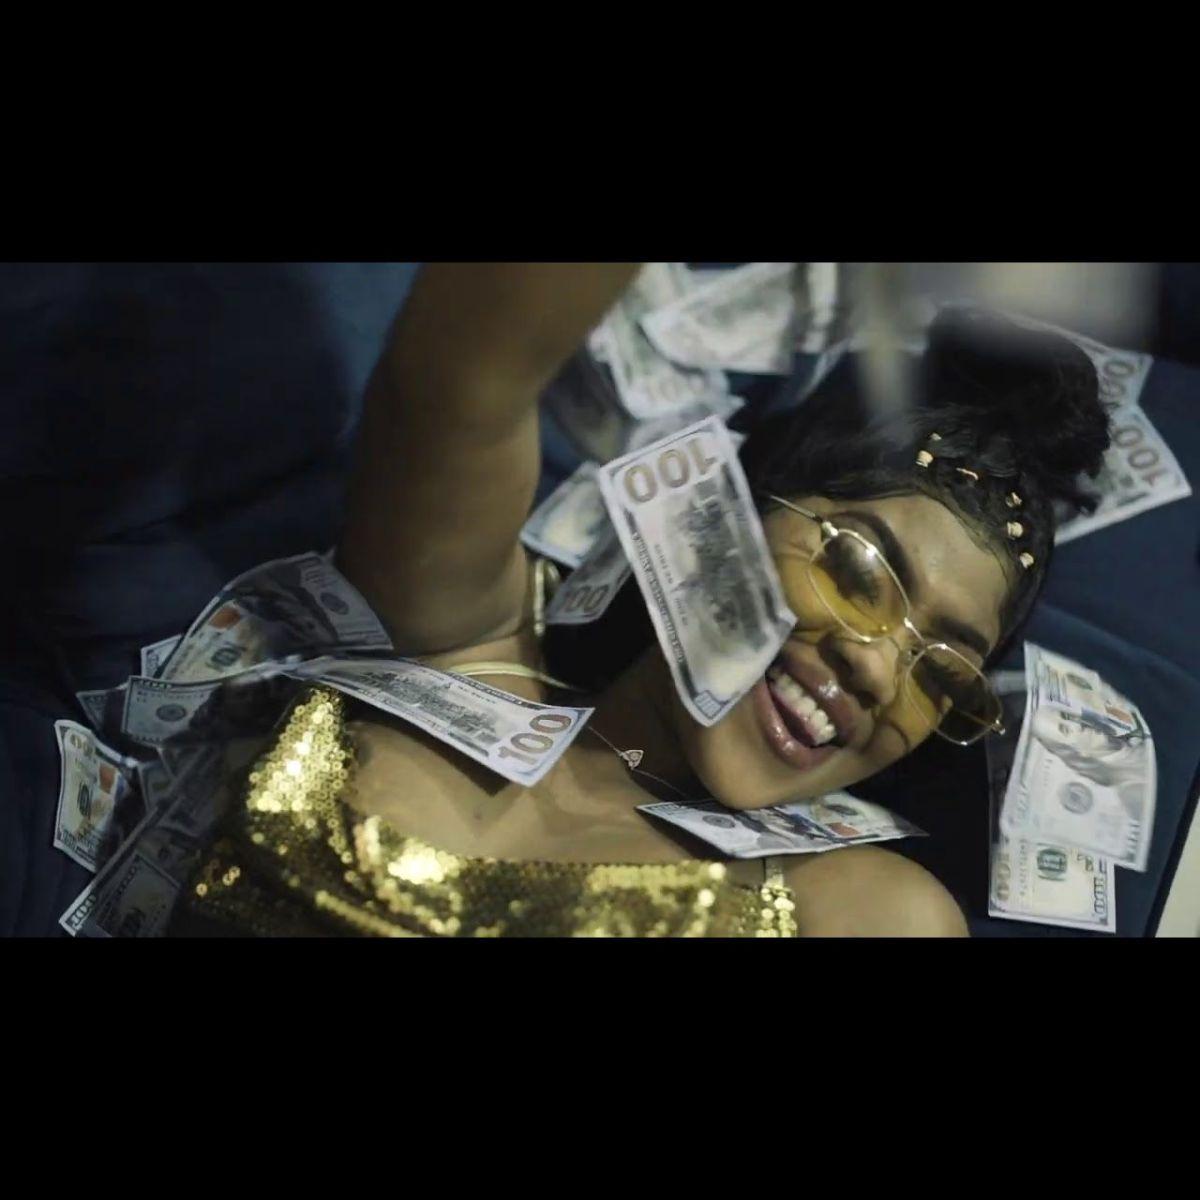 Squash, Vybz Kartel and Chronic Law - Money We Love (Thumbnail)